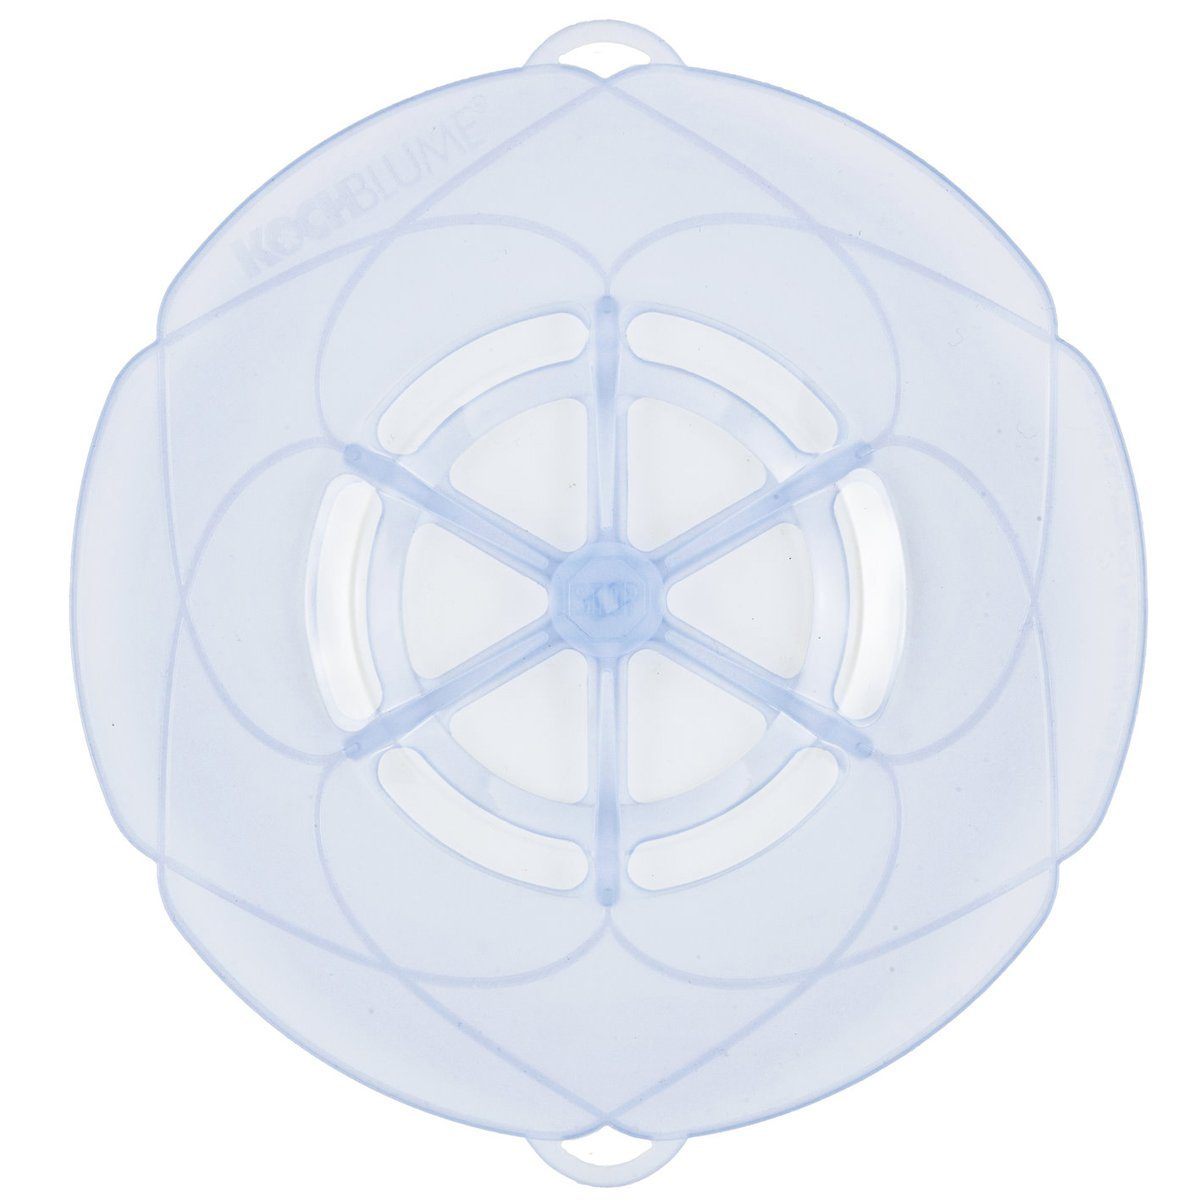 Kochblume Kochblume Überkochschutz eisblau 25.5 cm